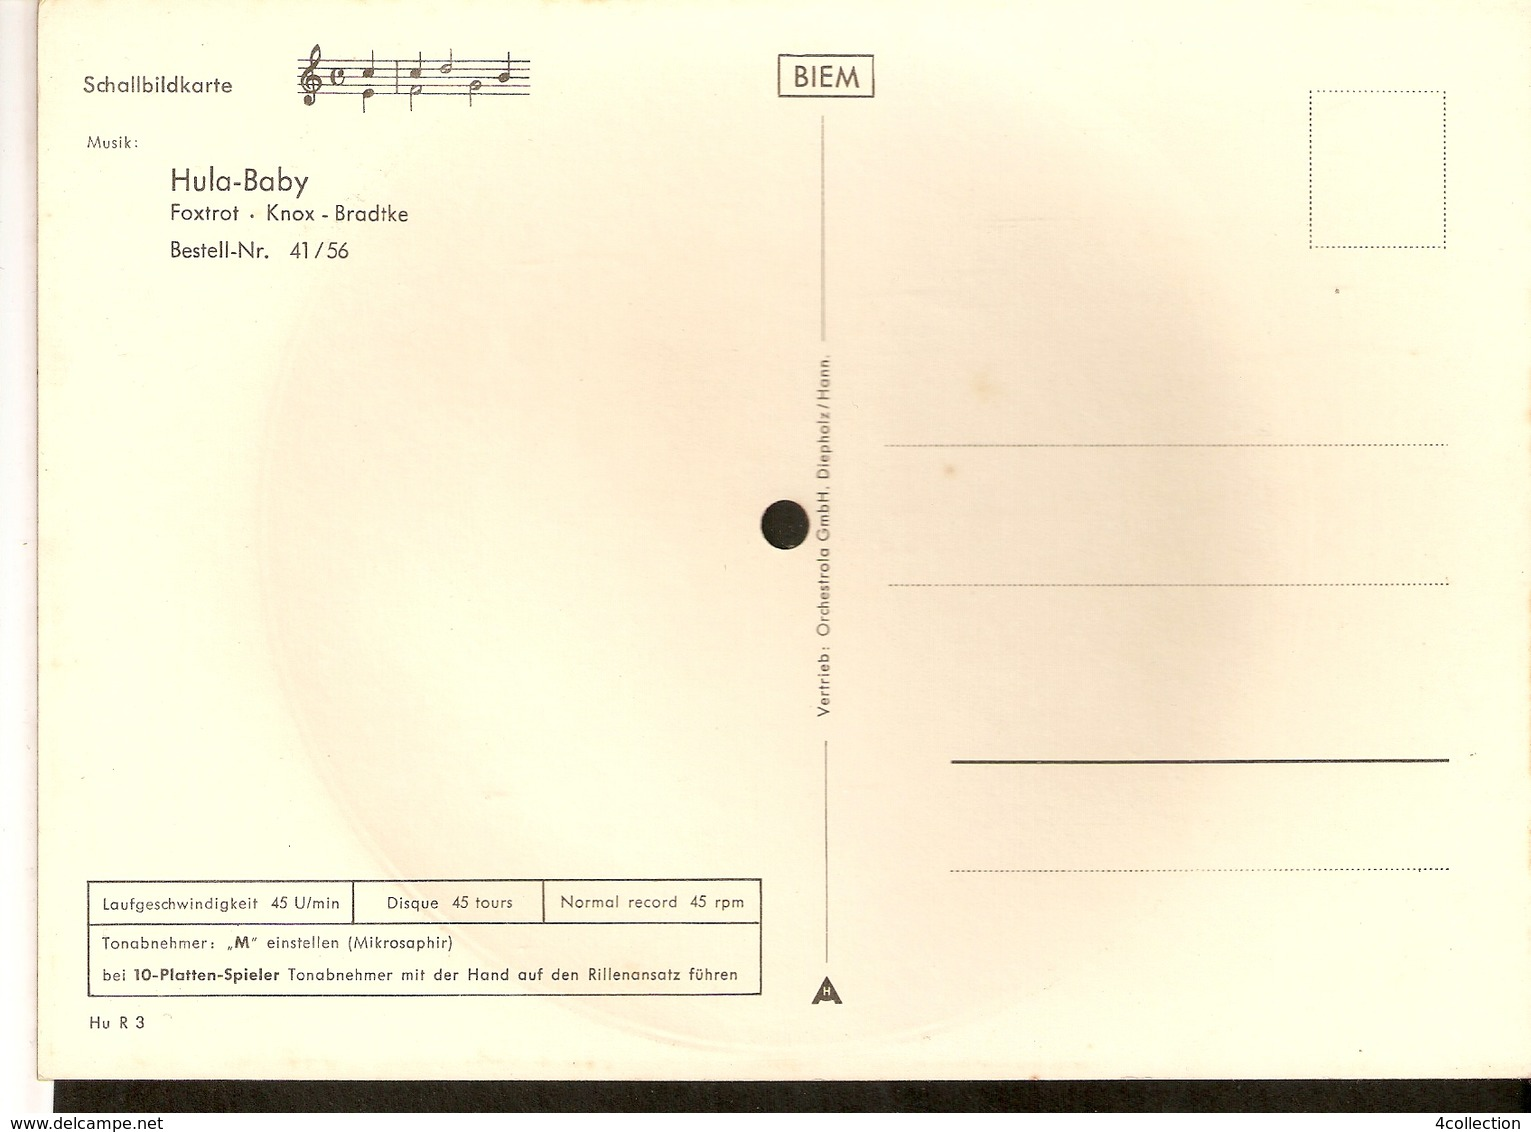 Old Musical 45rpm Record Postcard Hula-Baby Knox Bradtke Foxtrot Schallbildkarte Dog Poodle - Vinyl Records